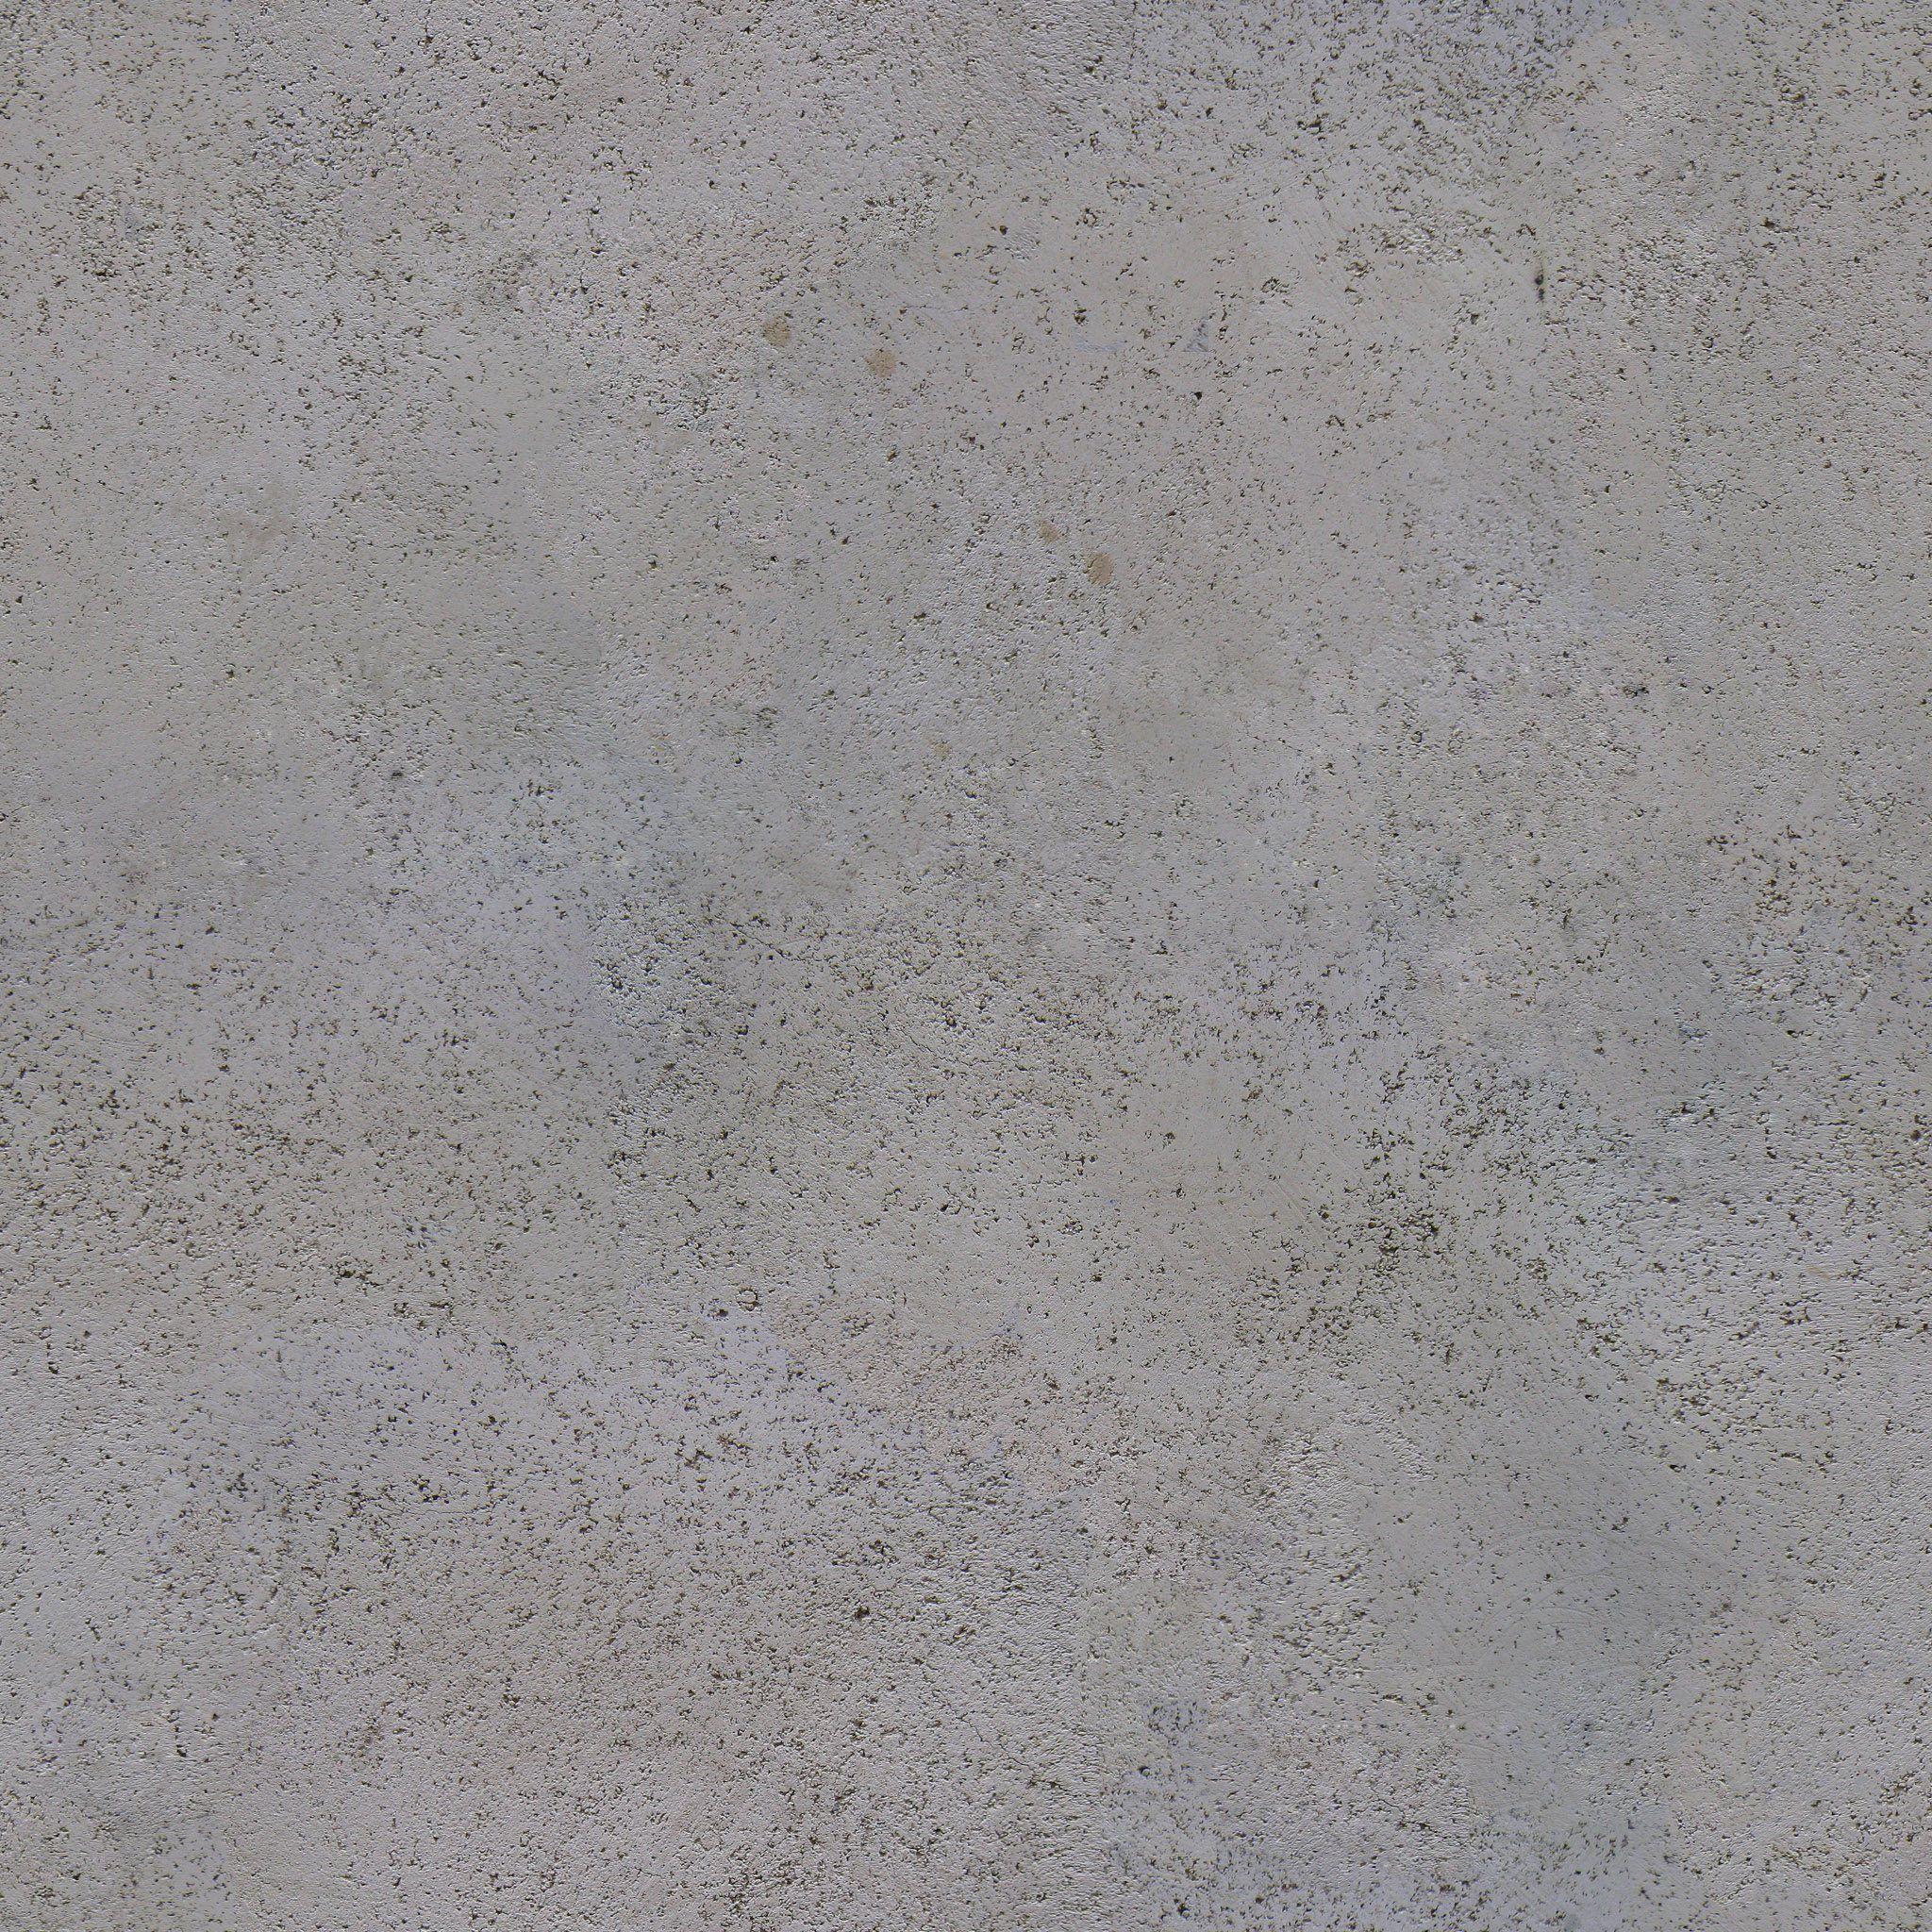 Concrete Floor Texture Seamless Inspiration Ideas